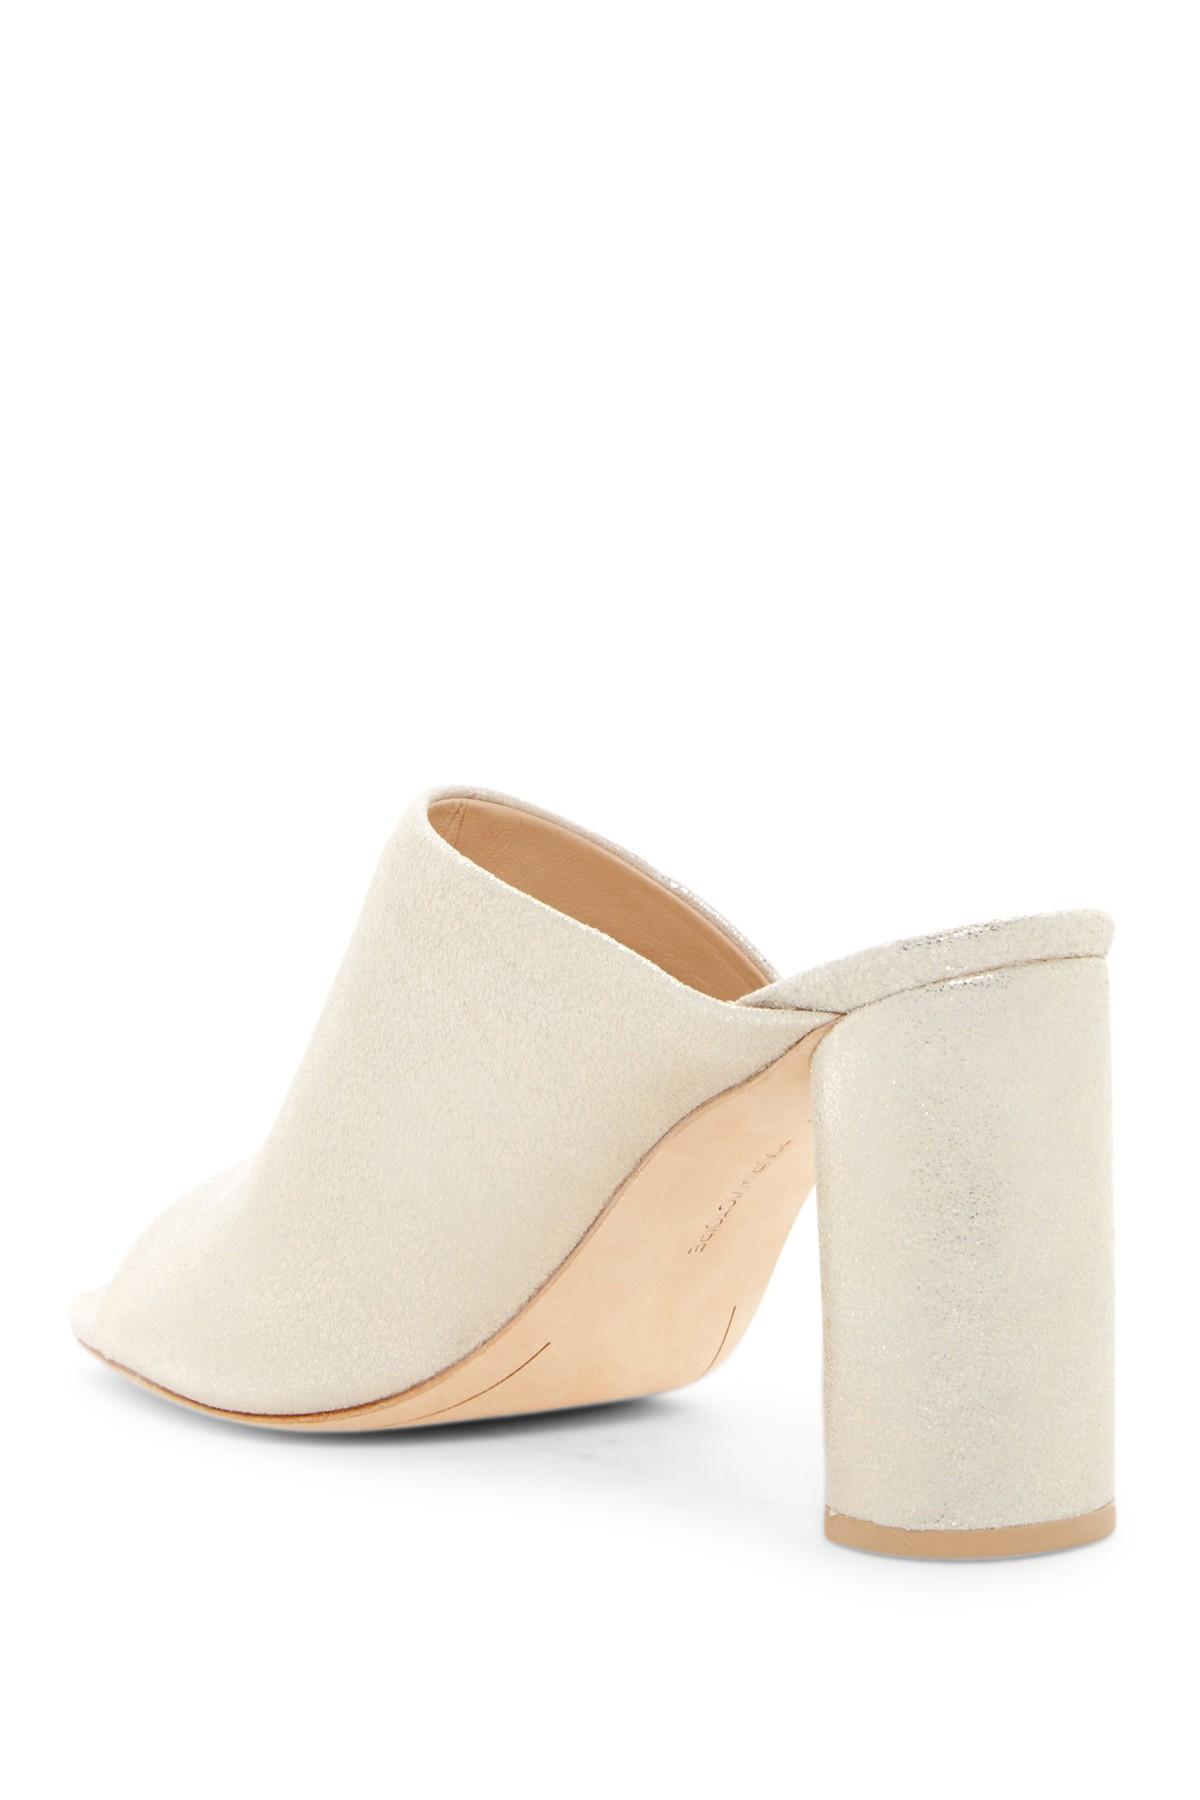 Pour La Victoire Helena Slide Heel On Peep Toe Wrapped Heel Slide Leder Champagne Mule 5a6b27